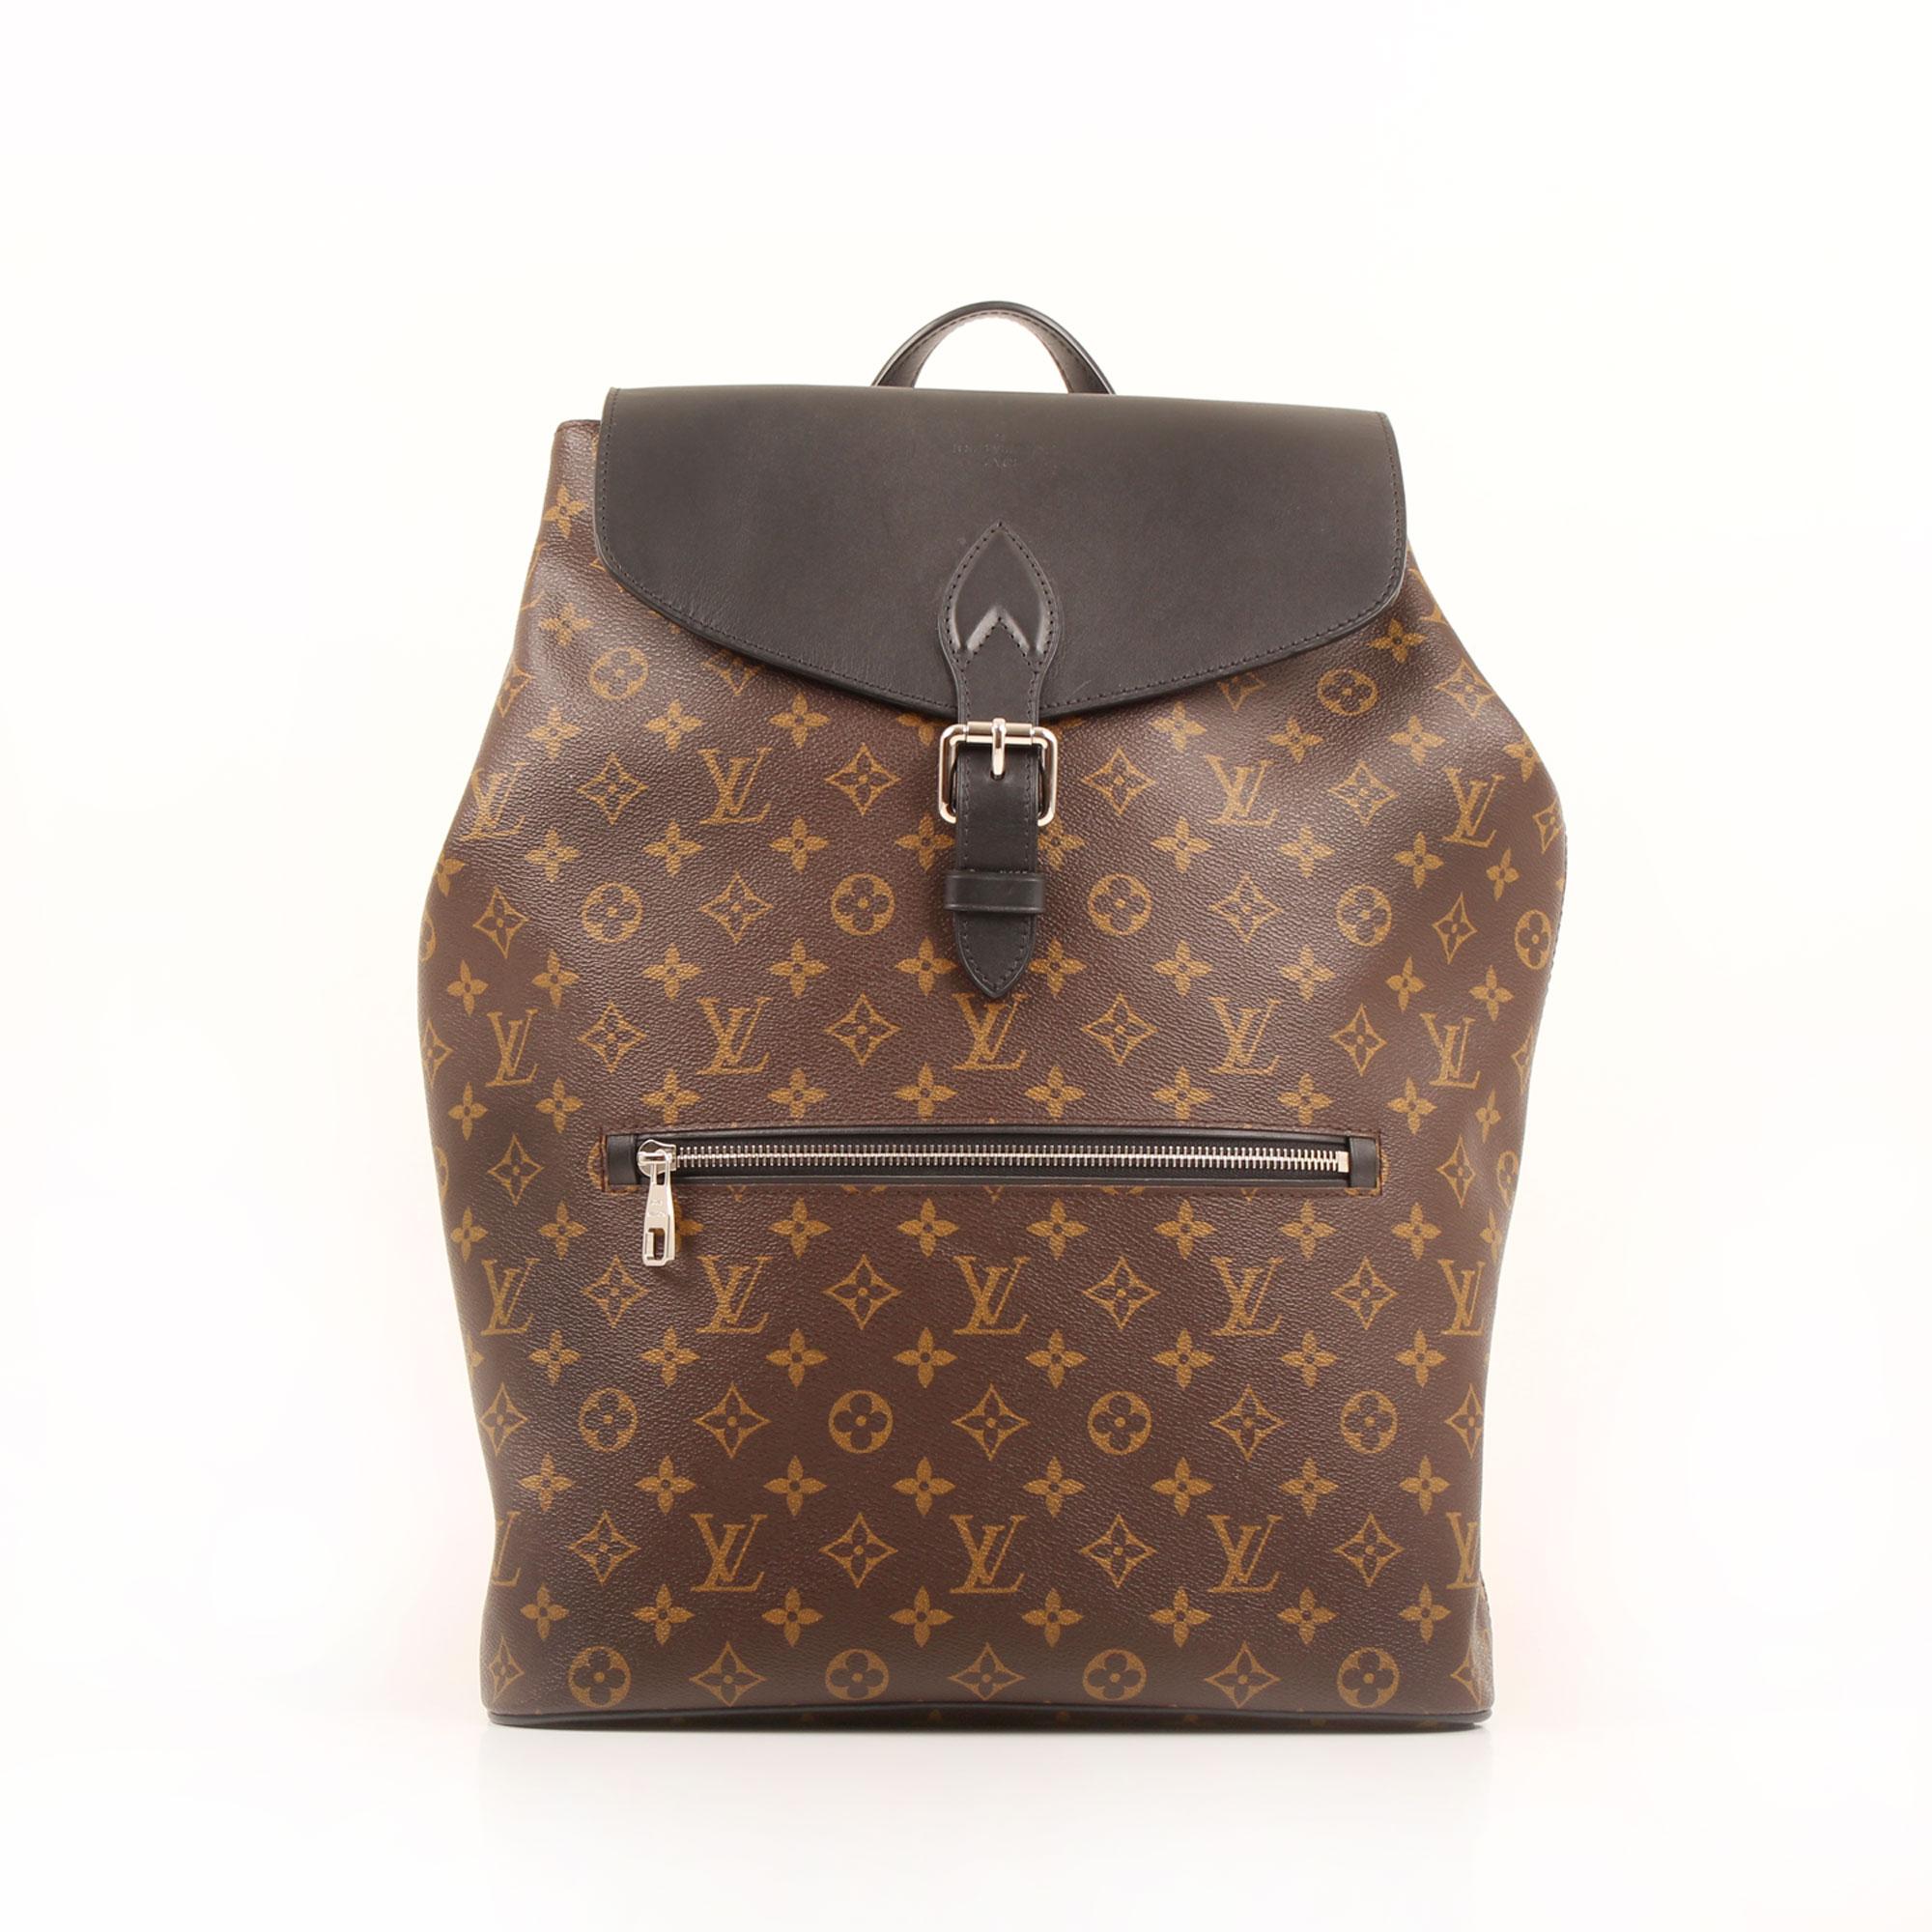 General image of louis vuitton palk monogram macassar backpack